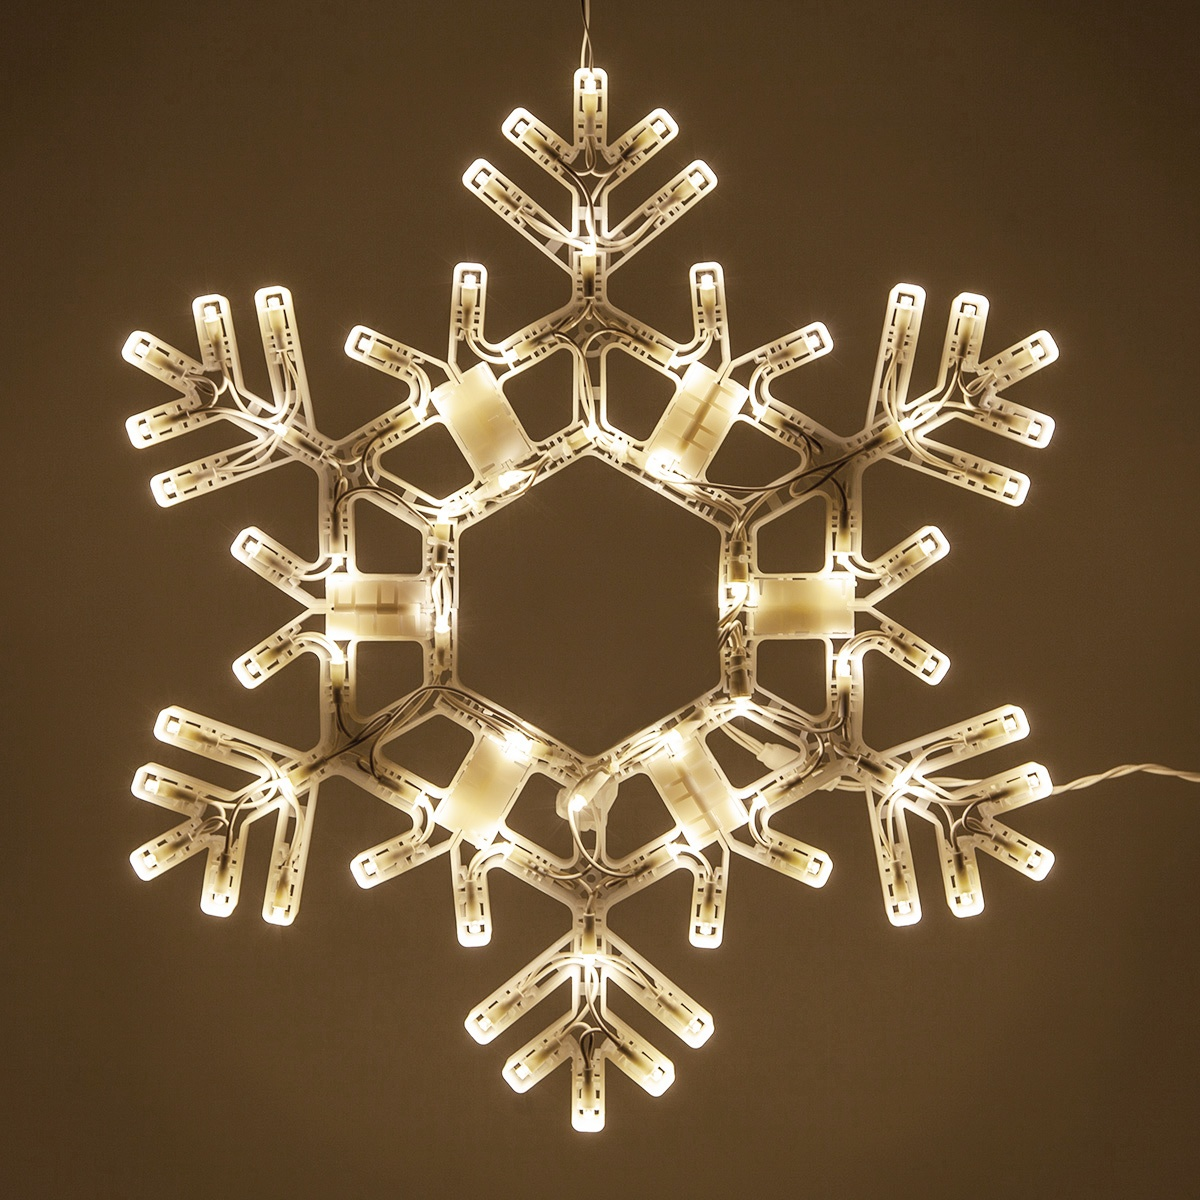 Snowflakes Amp Stars 20 Quot Led Folding Snowflake Warm White